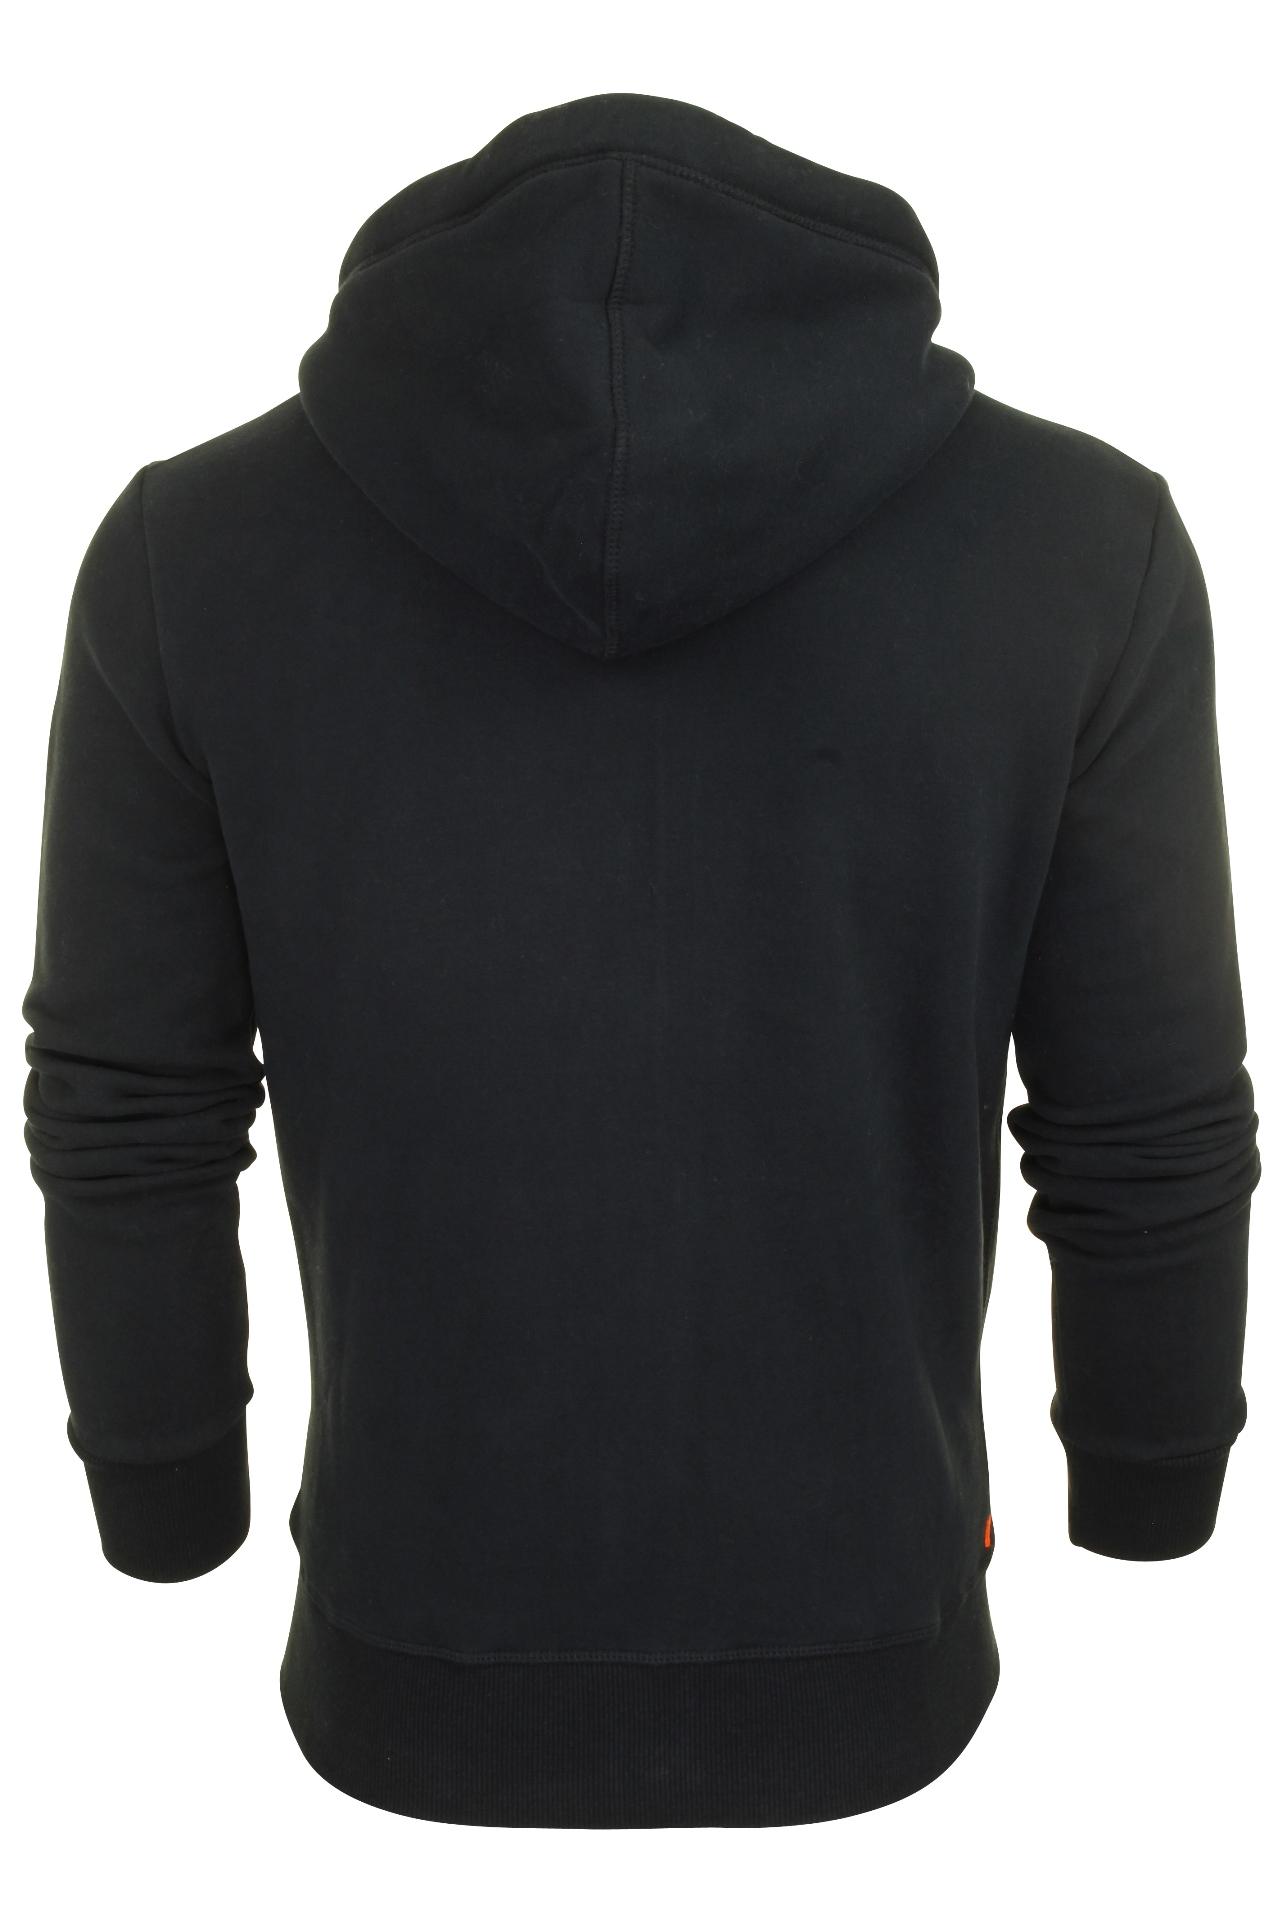 Superdry Mens /'Orange Label/' Zip Front Hoodie